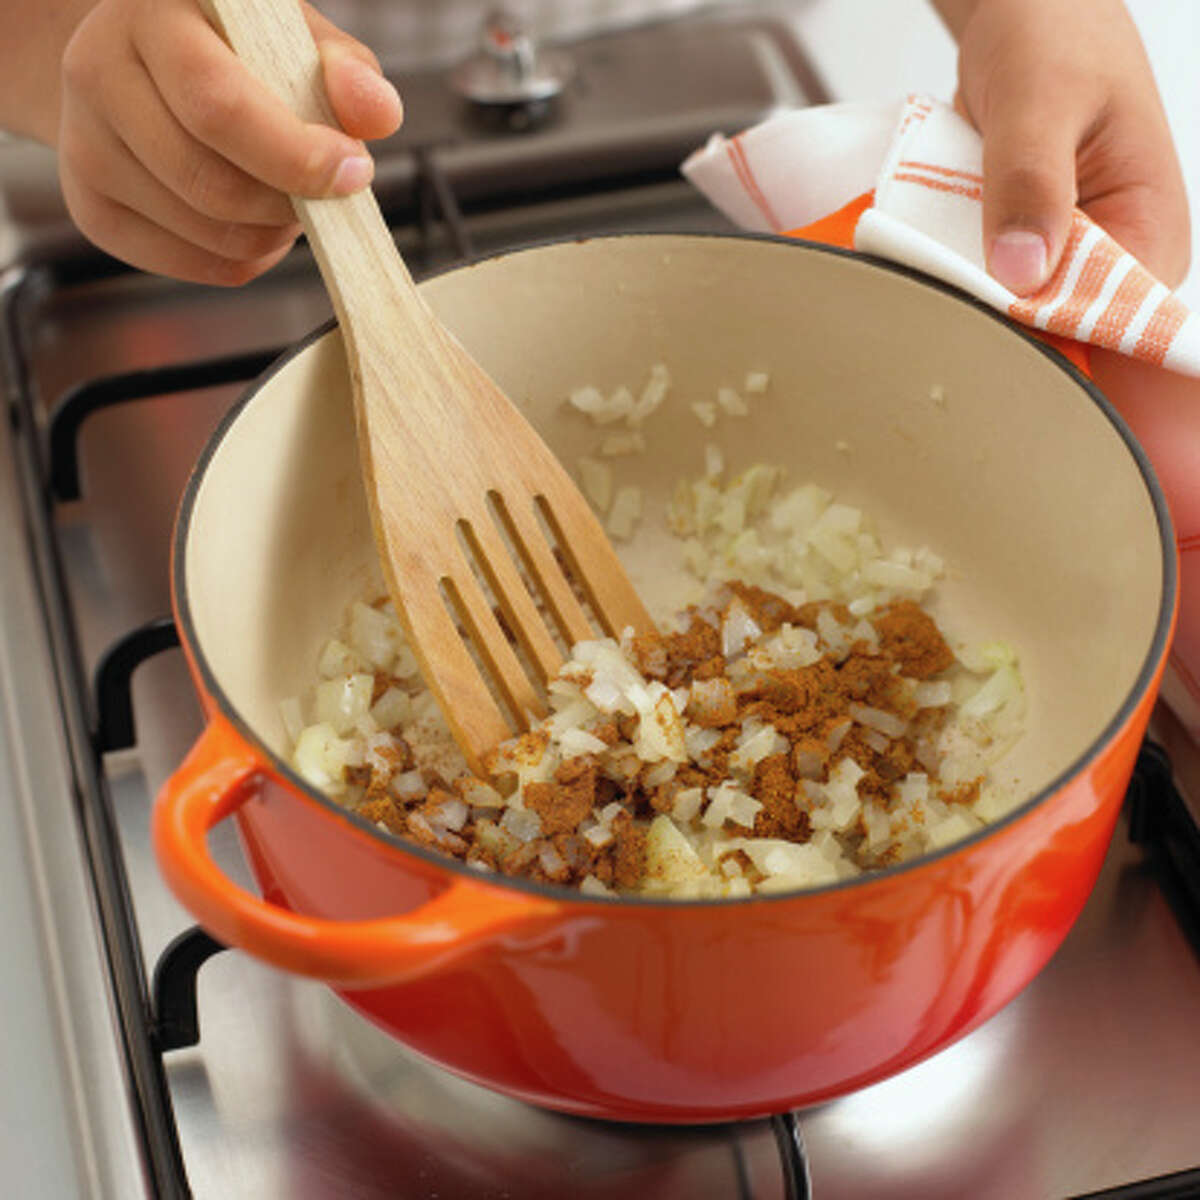 15. Cooking utensil Number of burn cases in 2013: 3